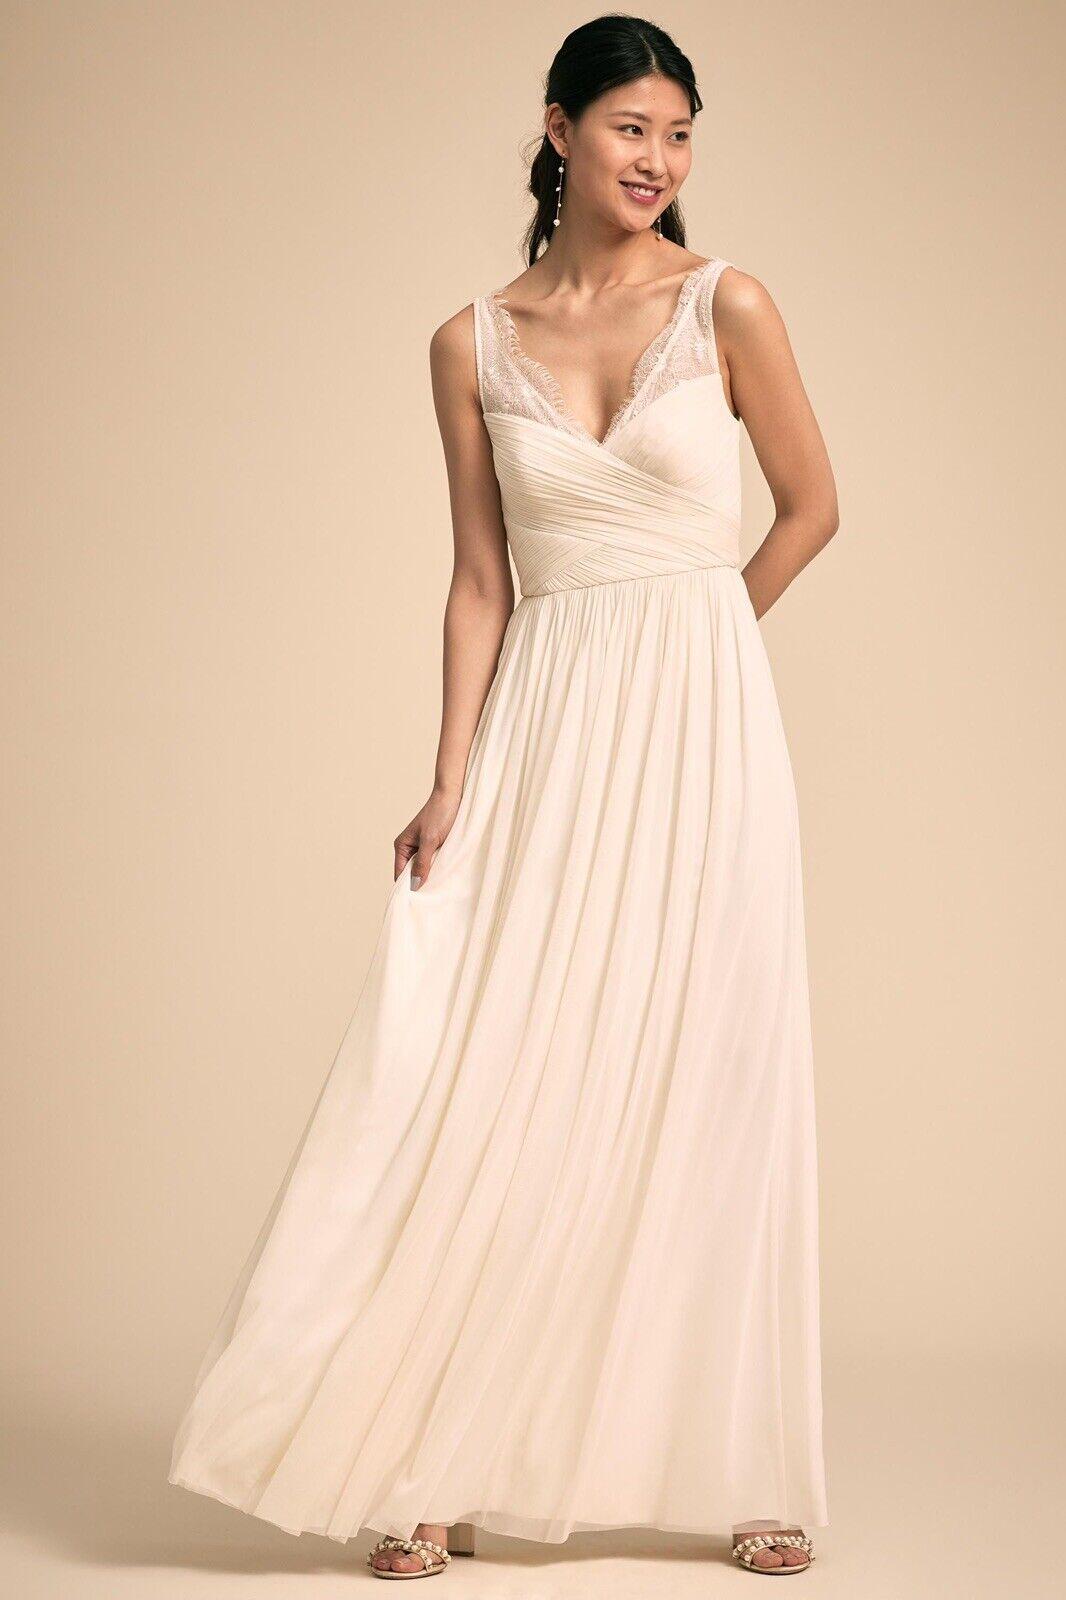 BHLDN Anthropologie Ivory/White Wedding/Prom Dress Size 4